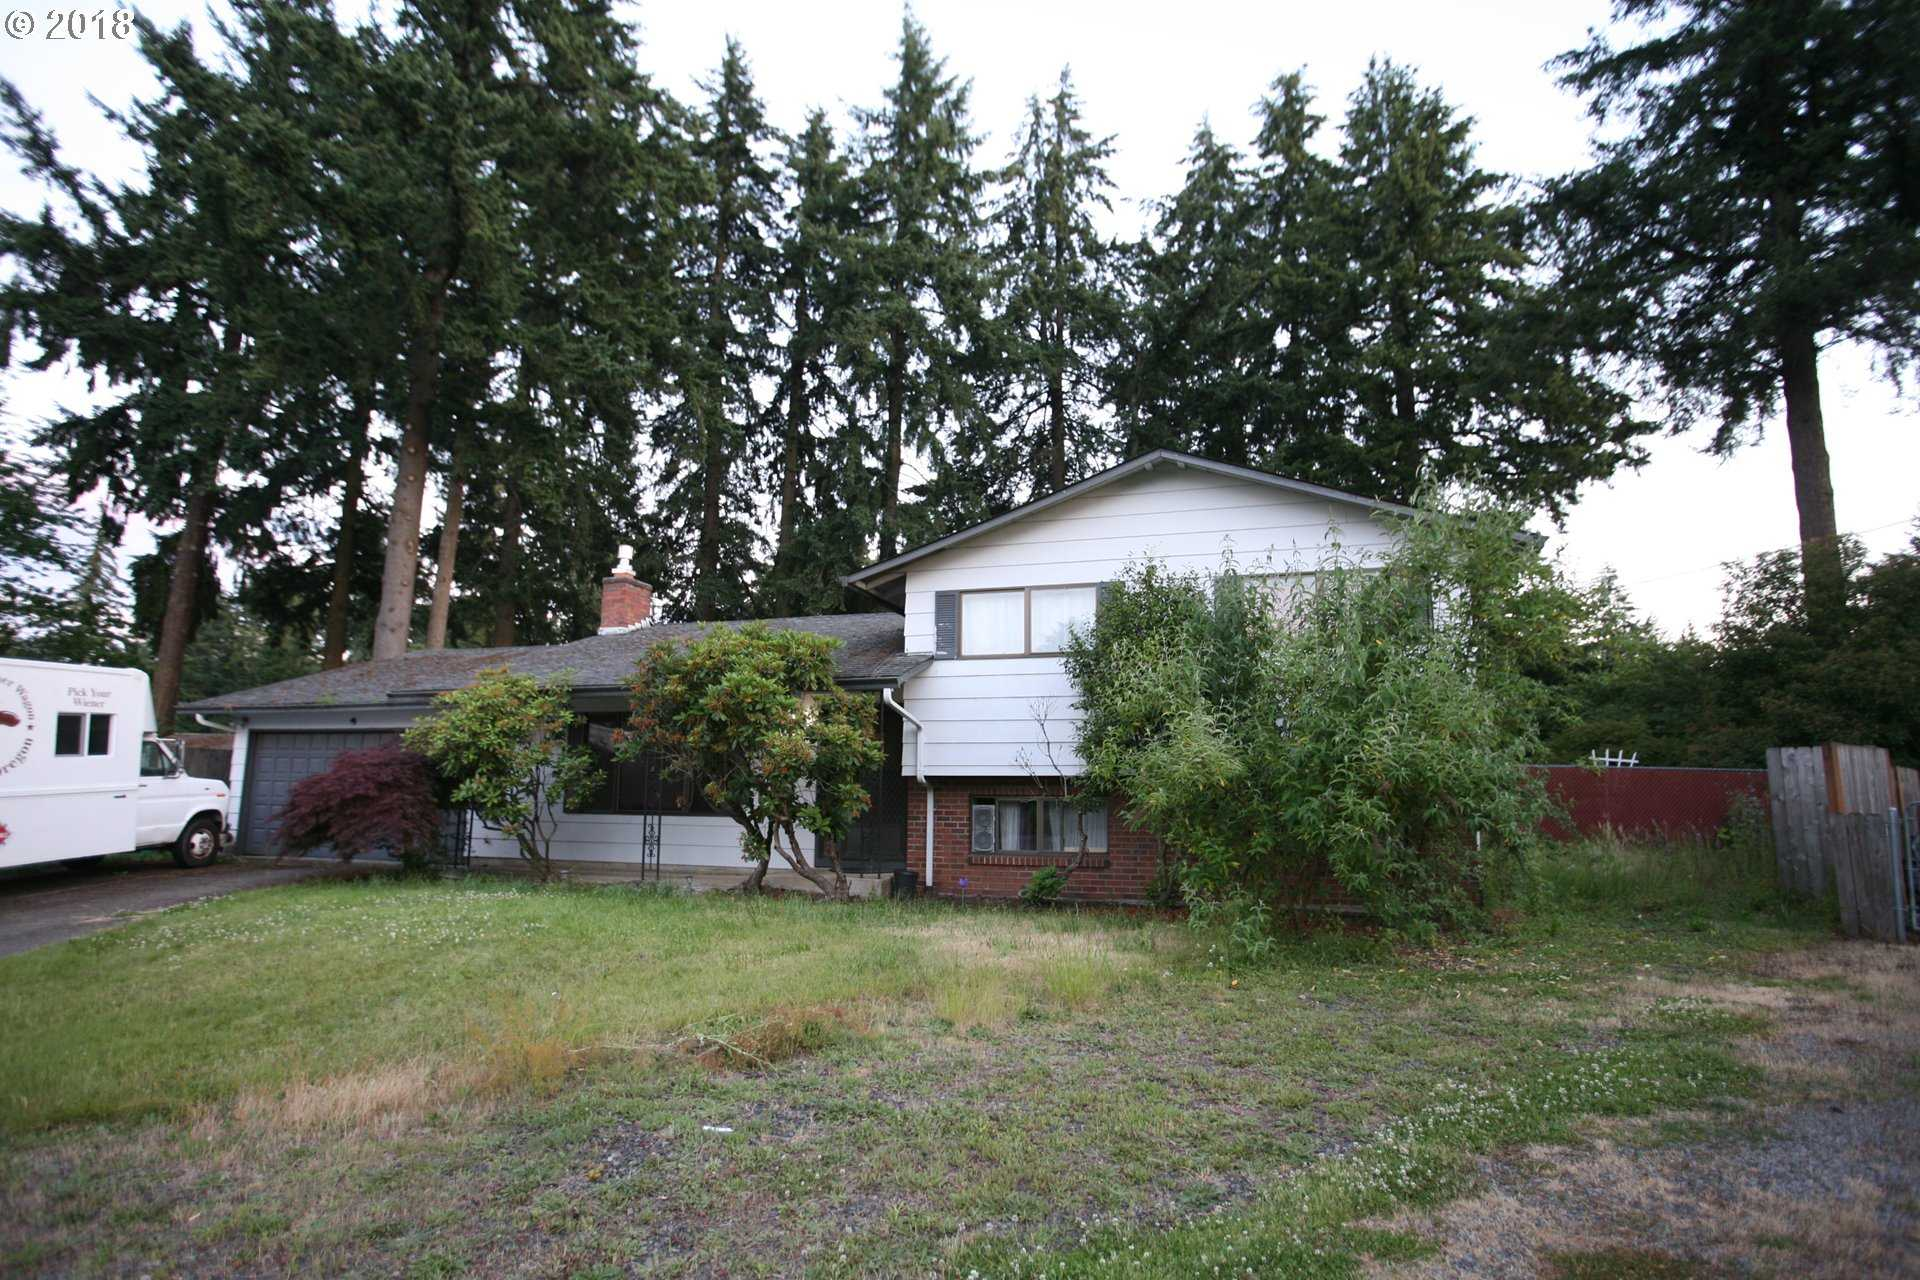 $344,000 - 4Br/3Ba -  for Sale in Rickadaro, Portland